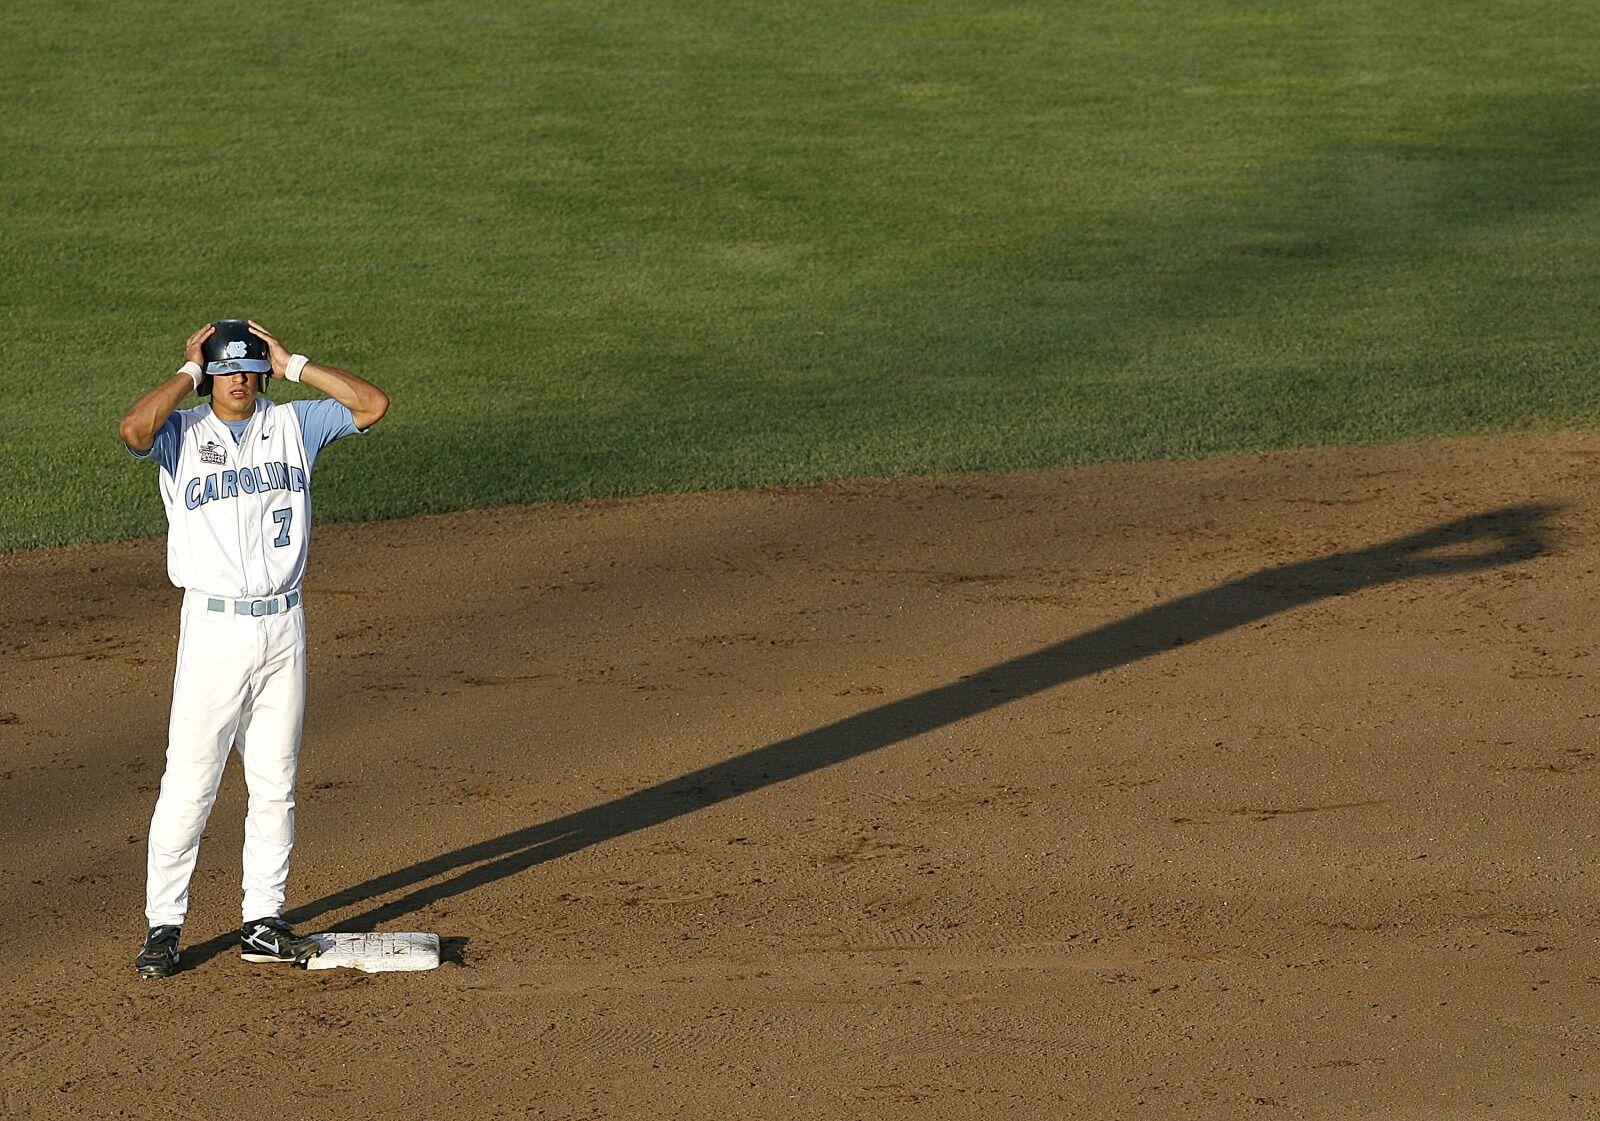 UNC Baseball: No. 13 Tar Heels prepare for South Carolina, Boston College